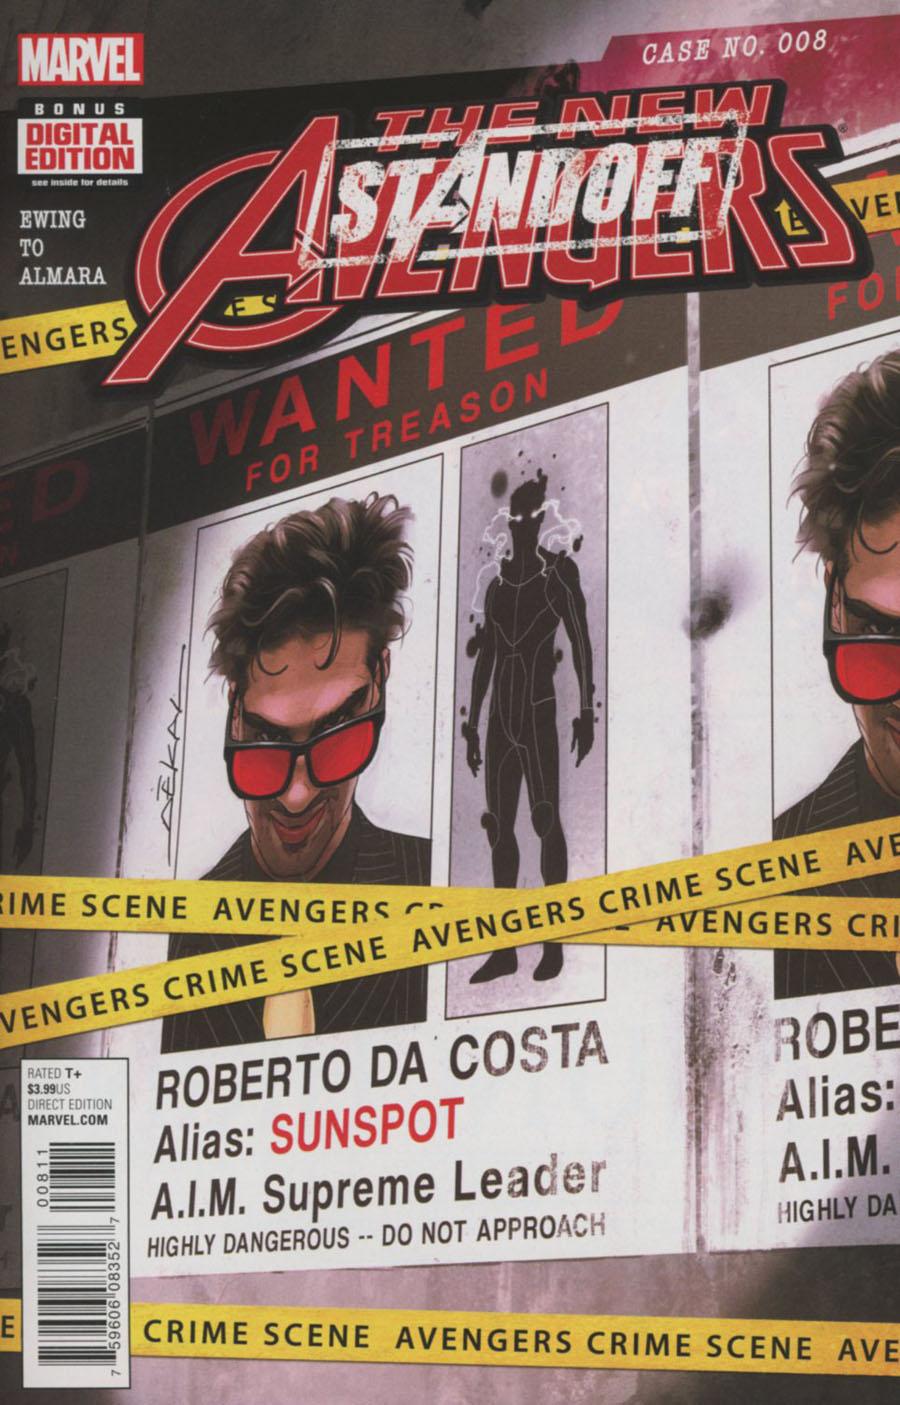 New Avengers Vol 4 #8 (Standoff Tie-In)